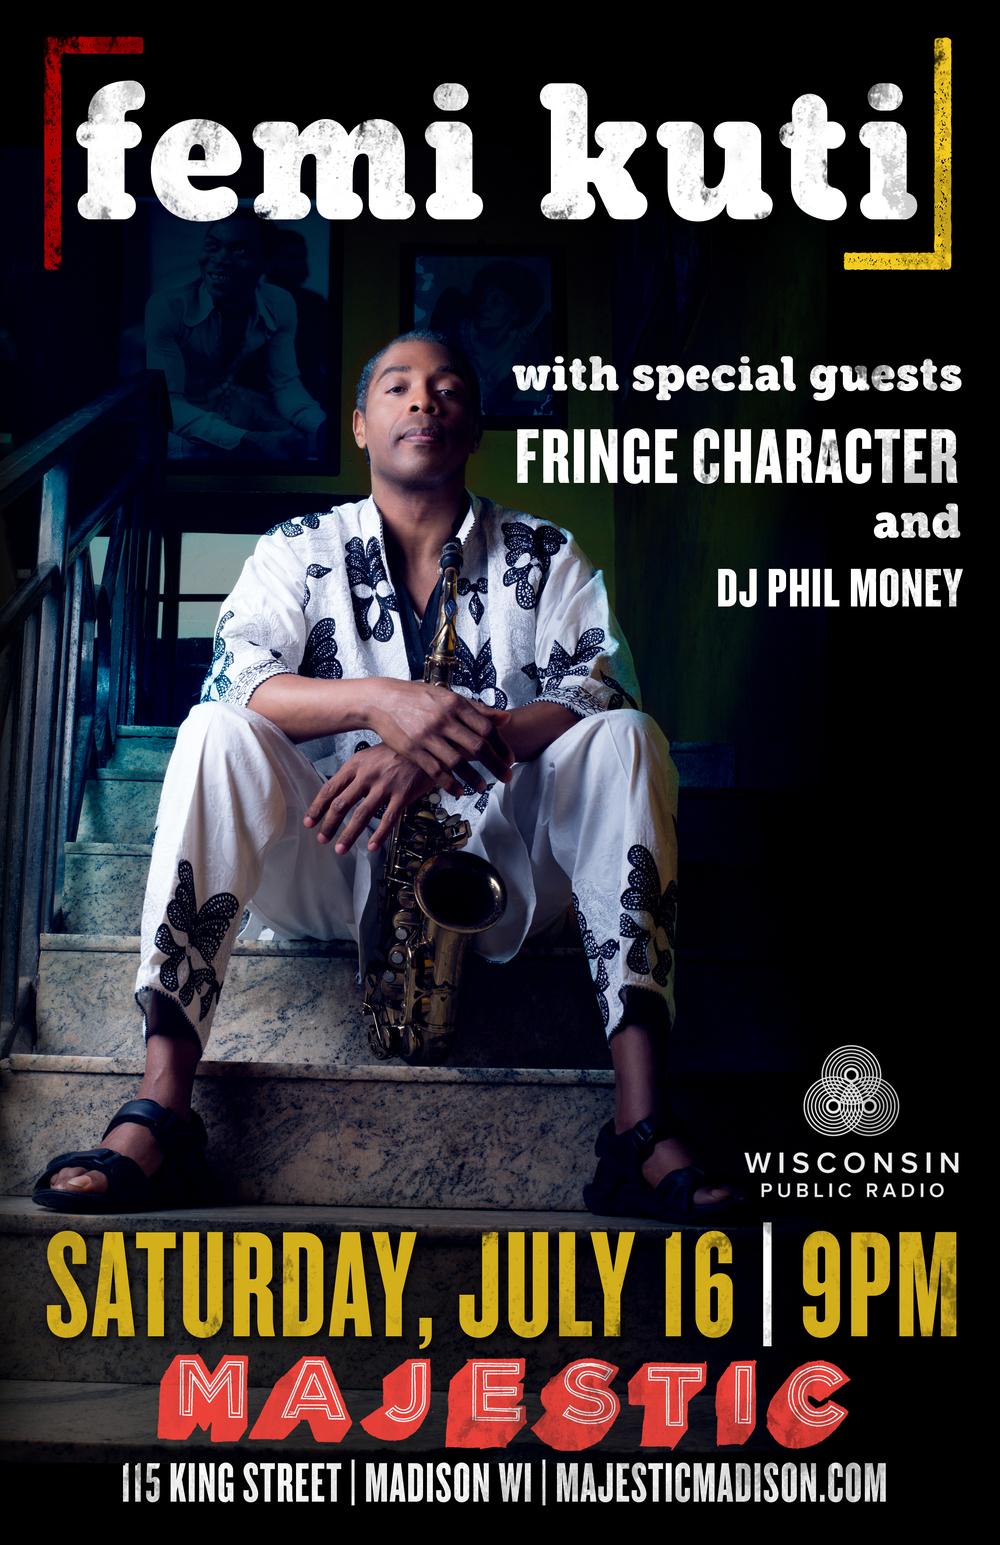 Femi Kuti   Fringe Character   DJ Phil Money